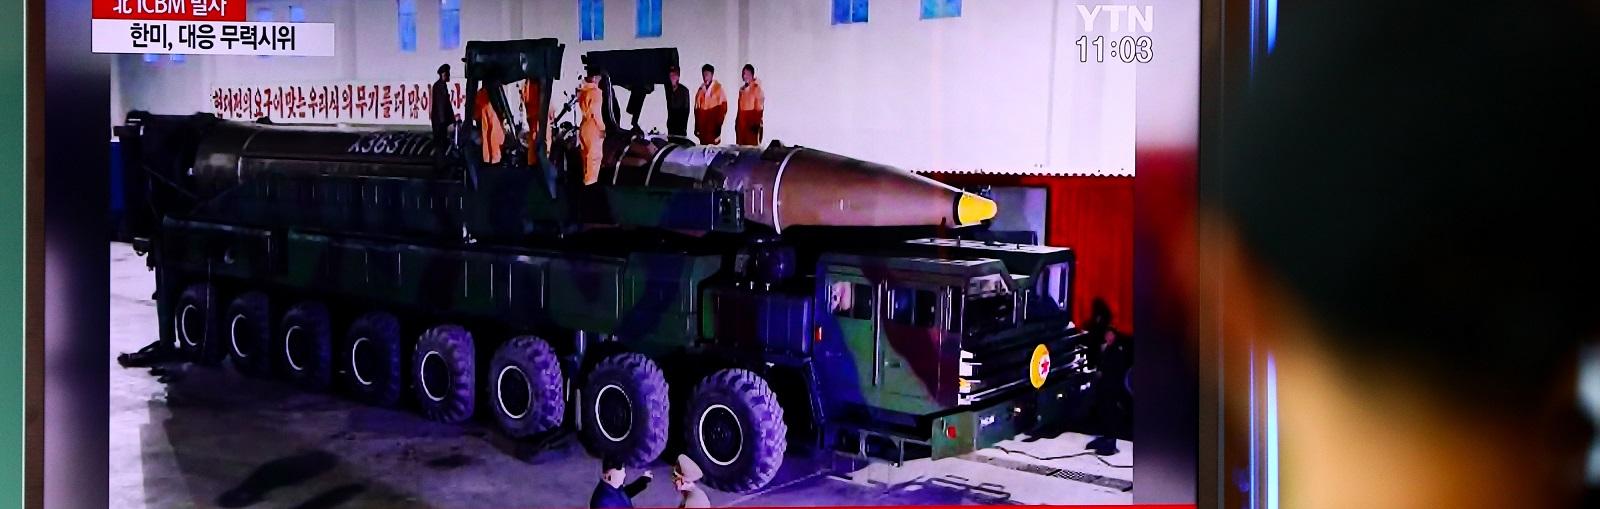 A news broadcast on North Korea's ballistic missile launch at Seoul Station last week (Photo: SeongJoon Cho/via Getty Images).